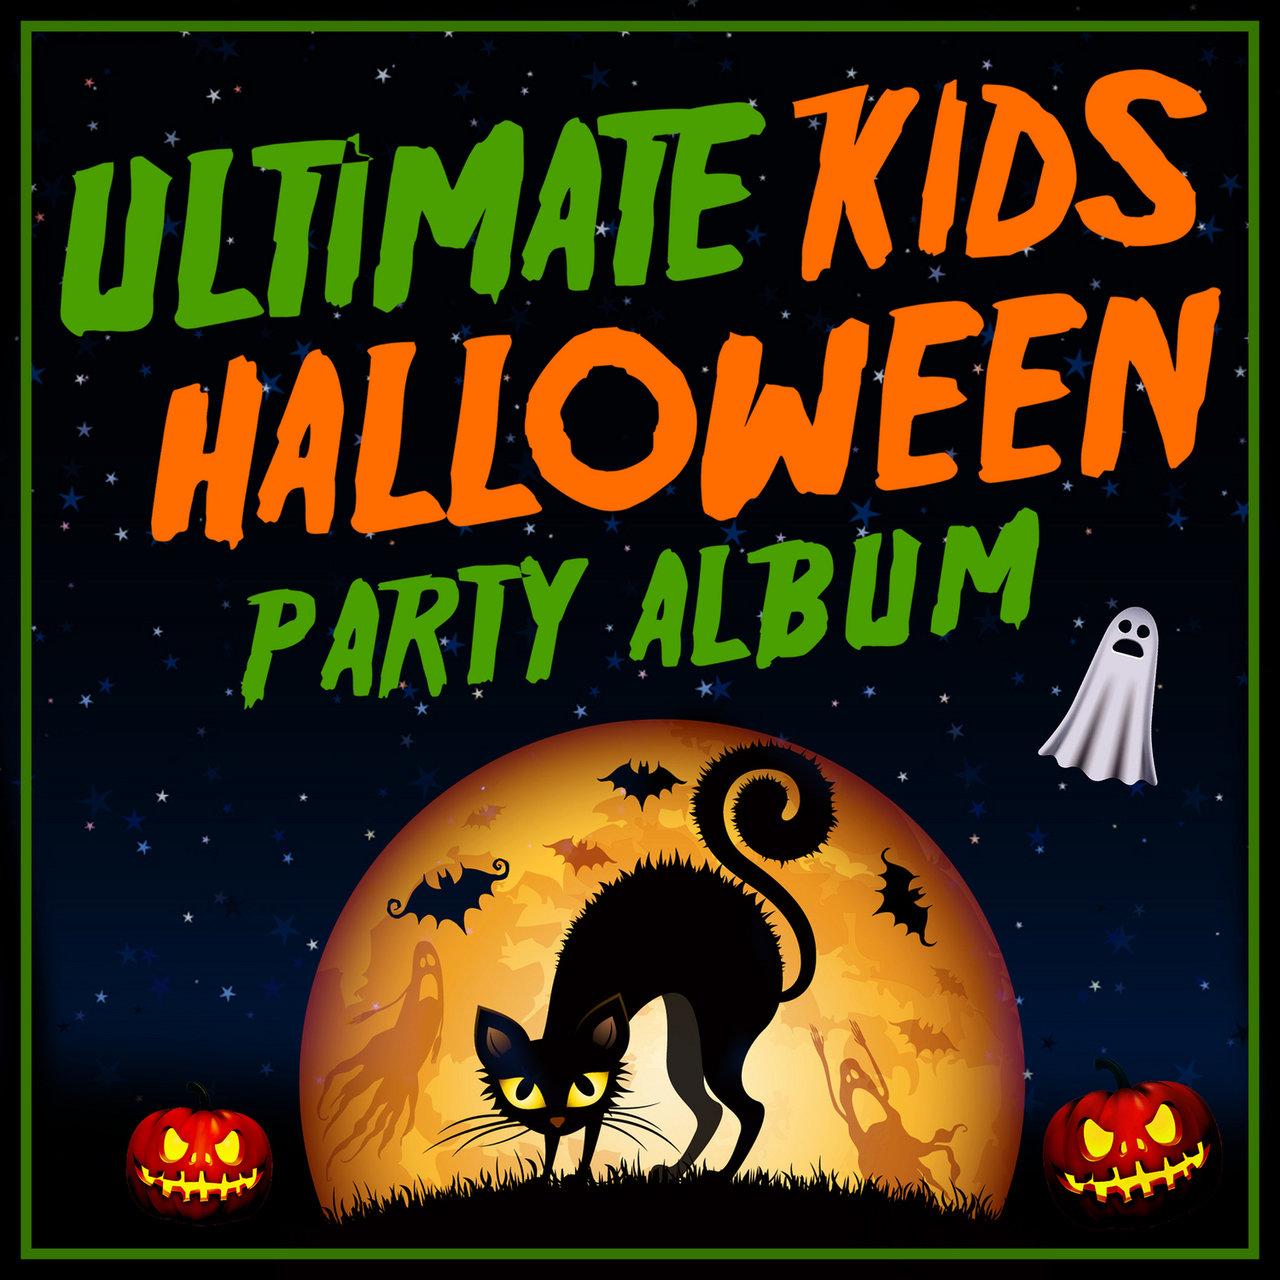 tidal: listen to ultimate kids halloween party album on tidal